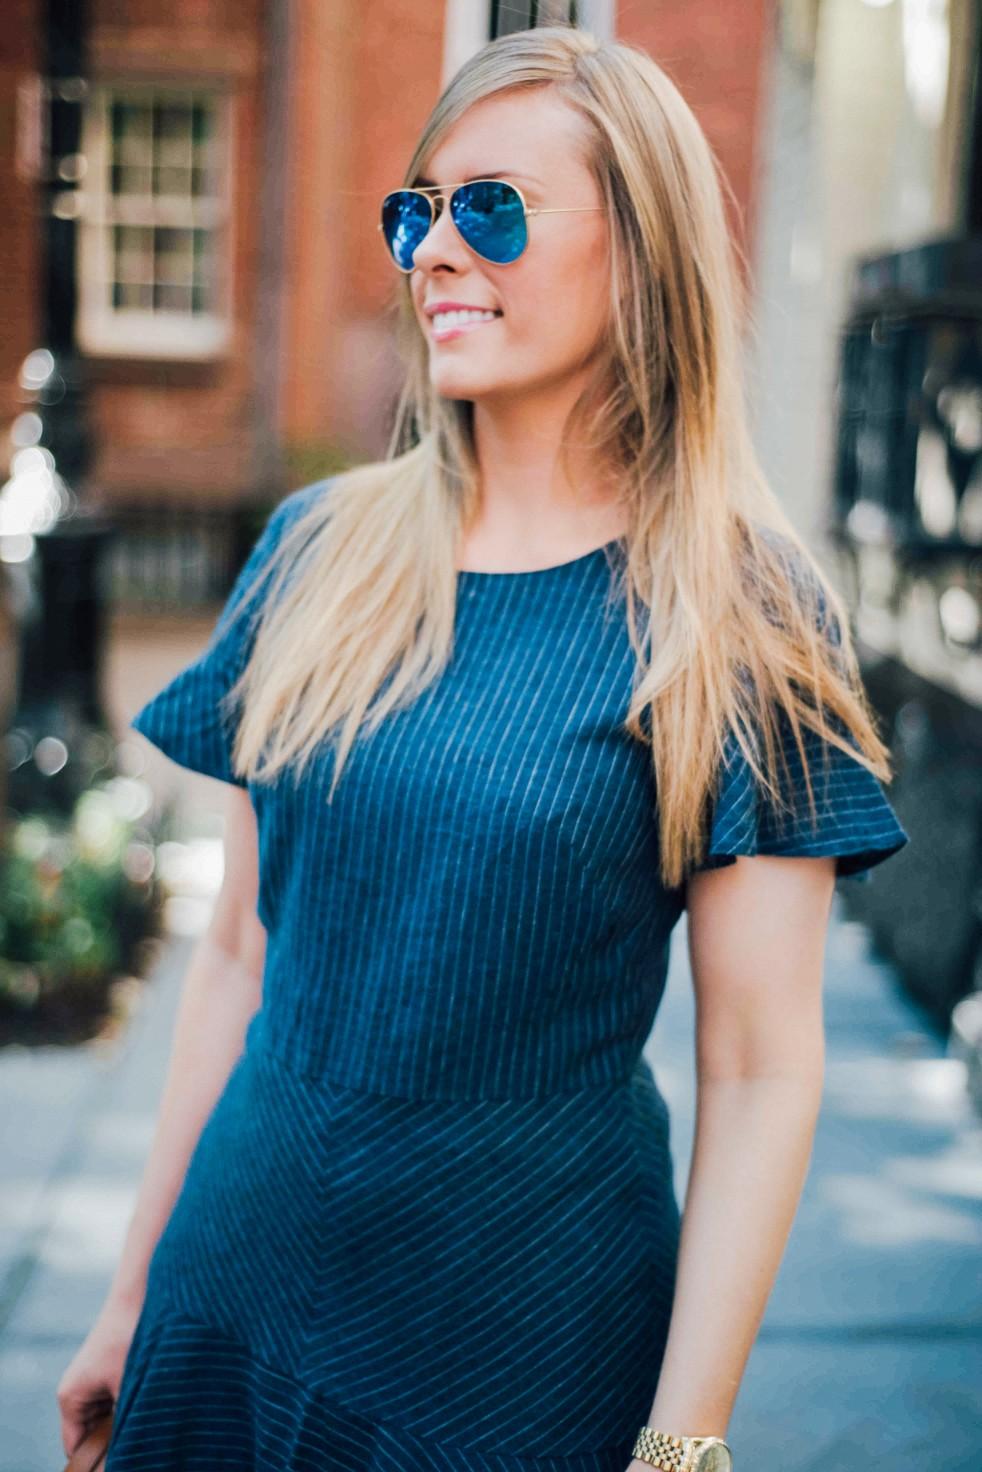 Banana Republic Denim Dress Dooney & Burke handbag | Summer Denim Dress Style featured by popular US fashion blogger Style Elixir